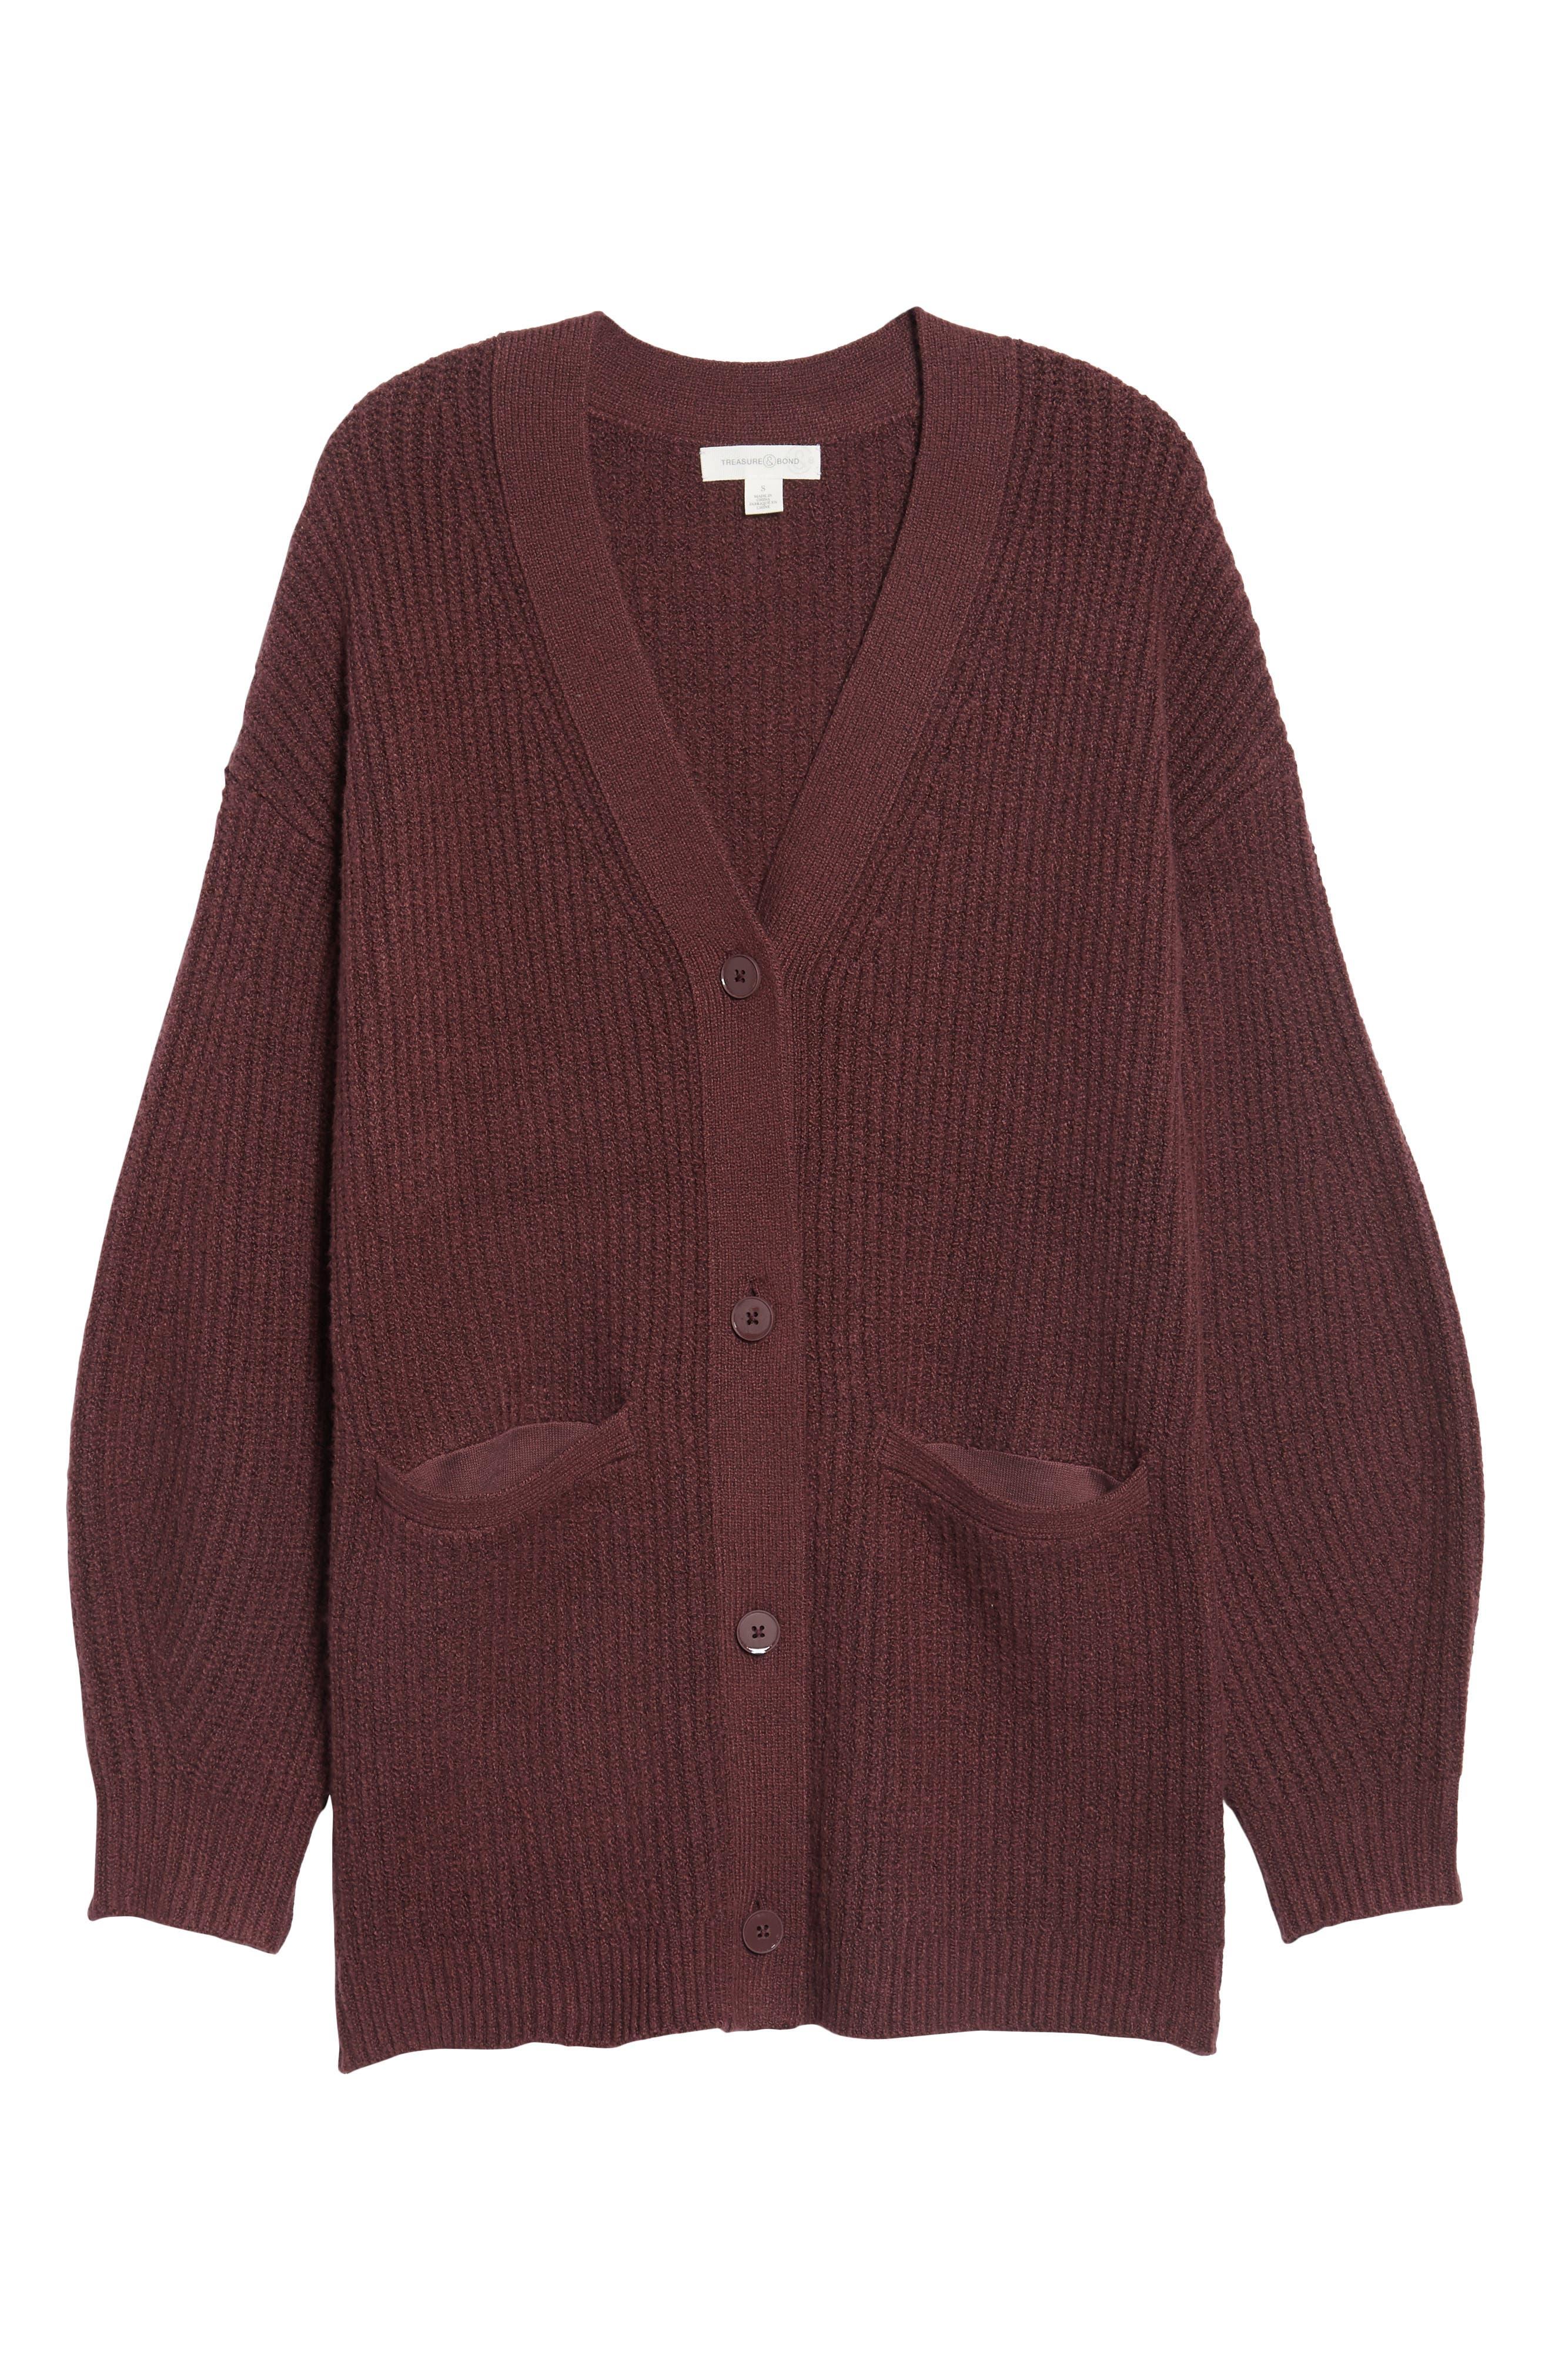 Ribbed Cardigan Sweater,                             Alternate thumbnail 6, color,                             Burgundy Fudge